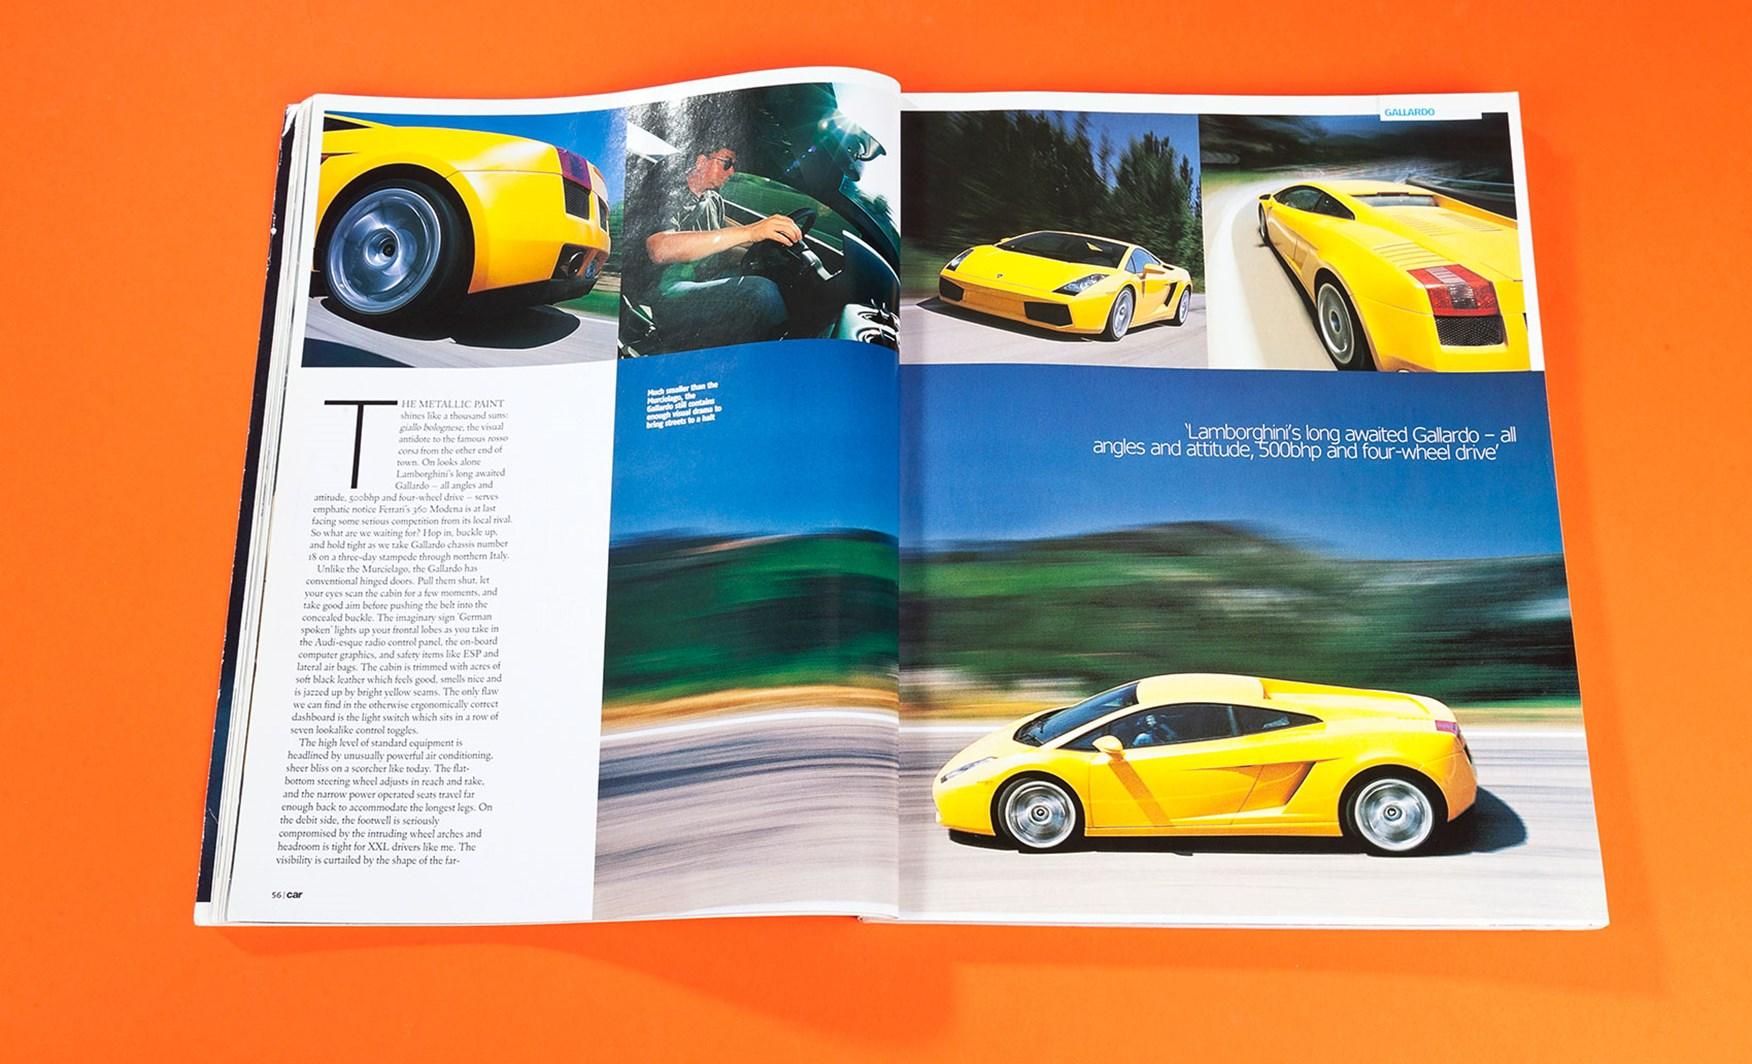 Thunder Flash Lamborghini Gallardo Review Car Archive 2003 Car Magazine